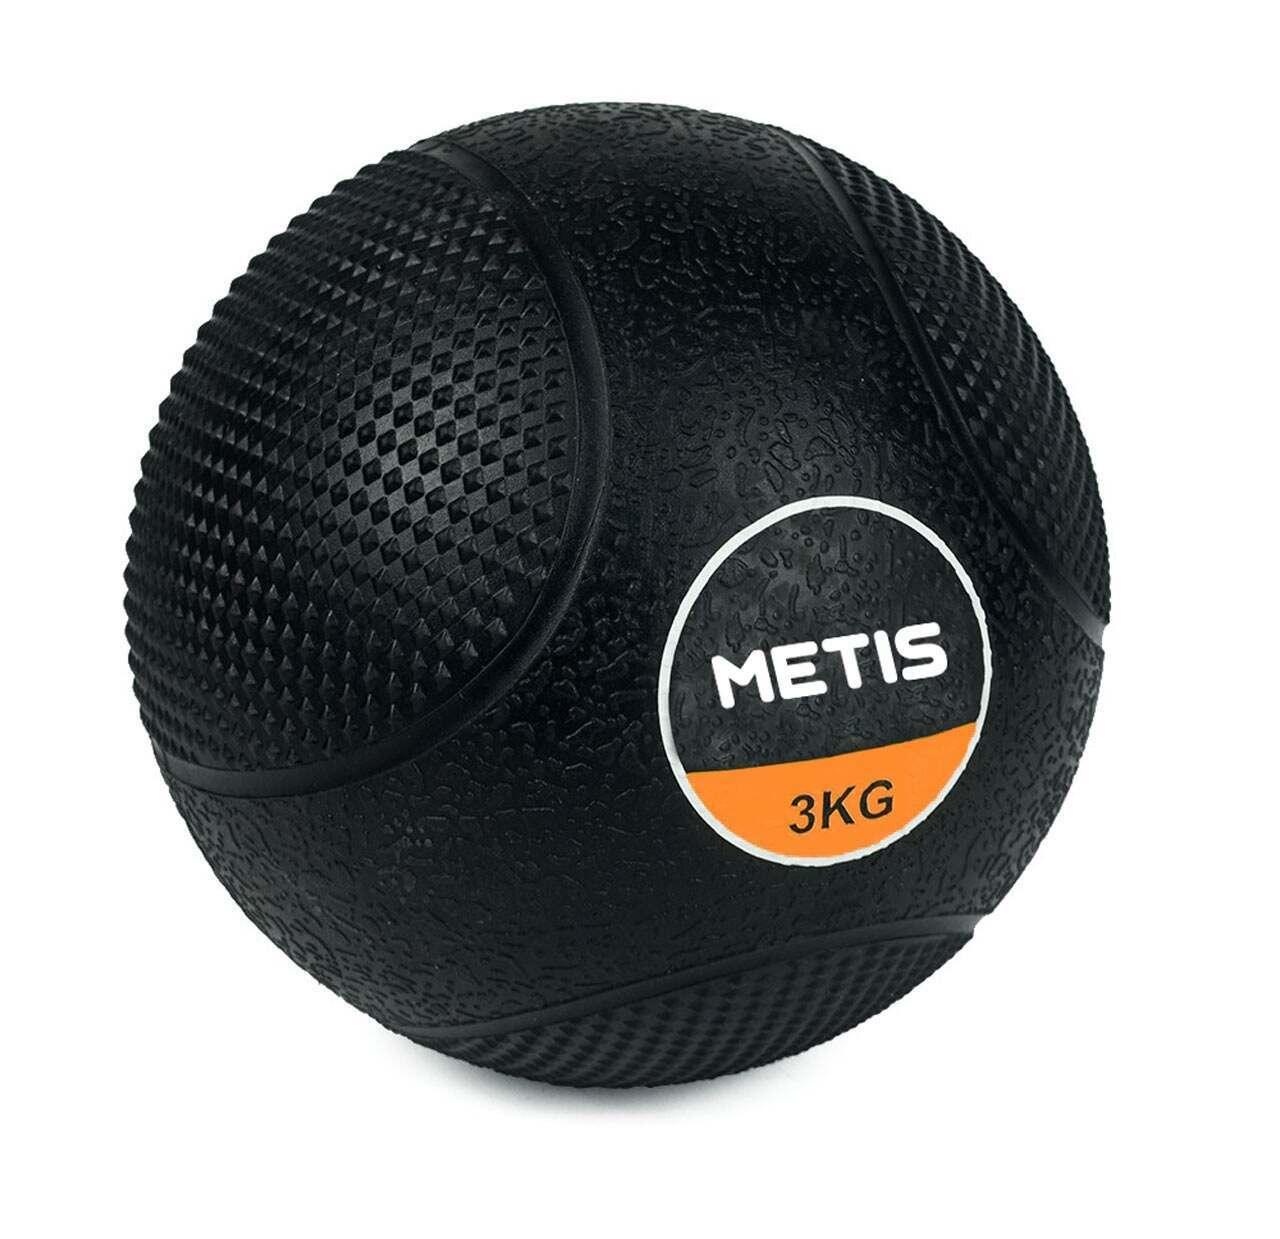 Metis Medicine Balls [2-22lbs]